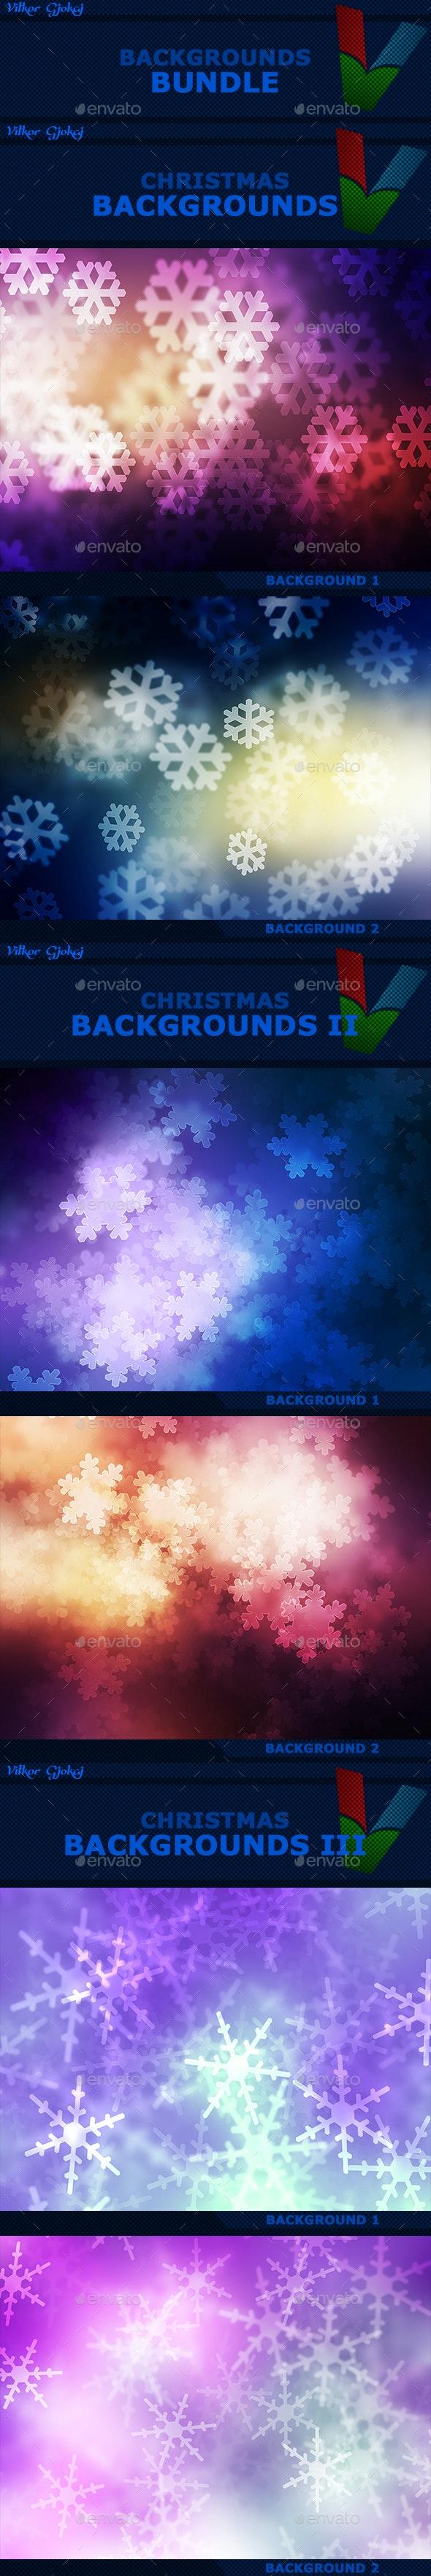 15 Christmas Backgrounds Bundle - Abstract Backgrounds